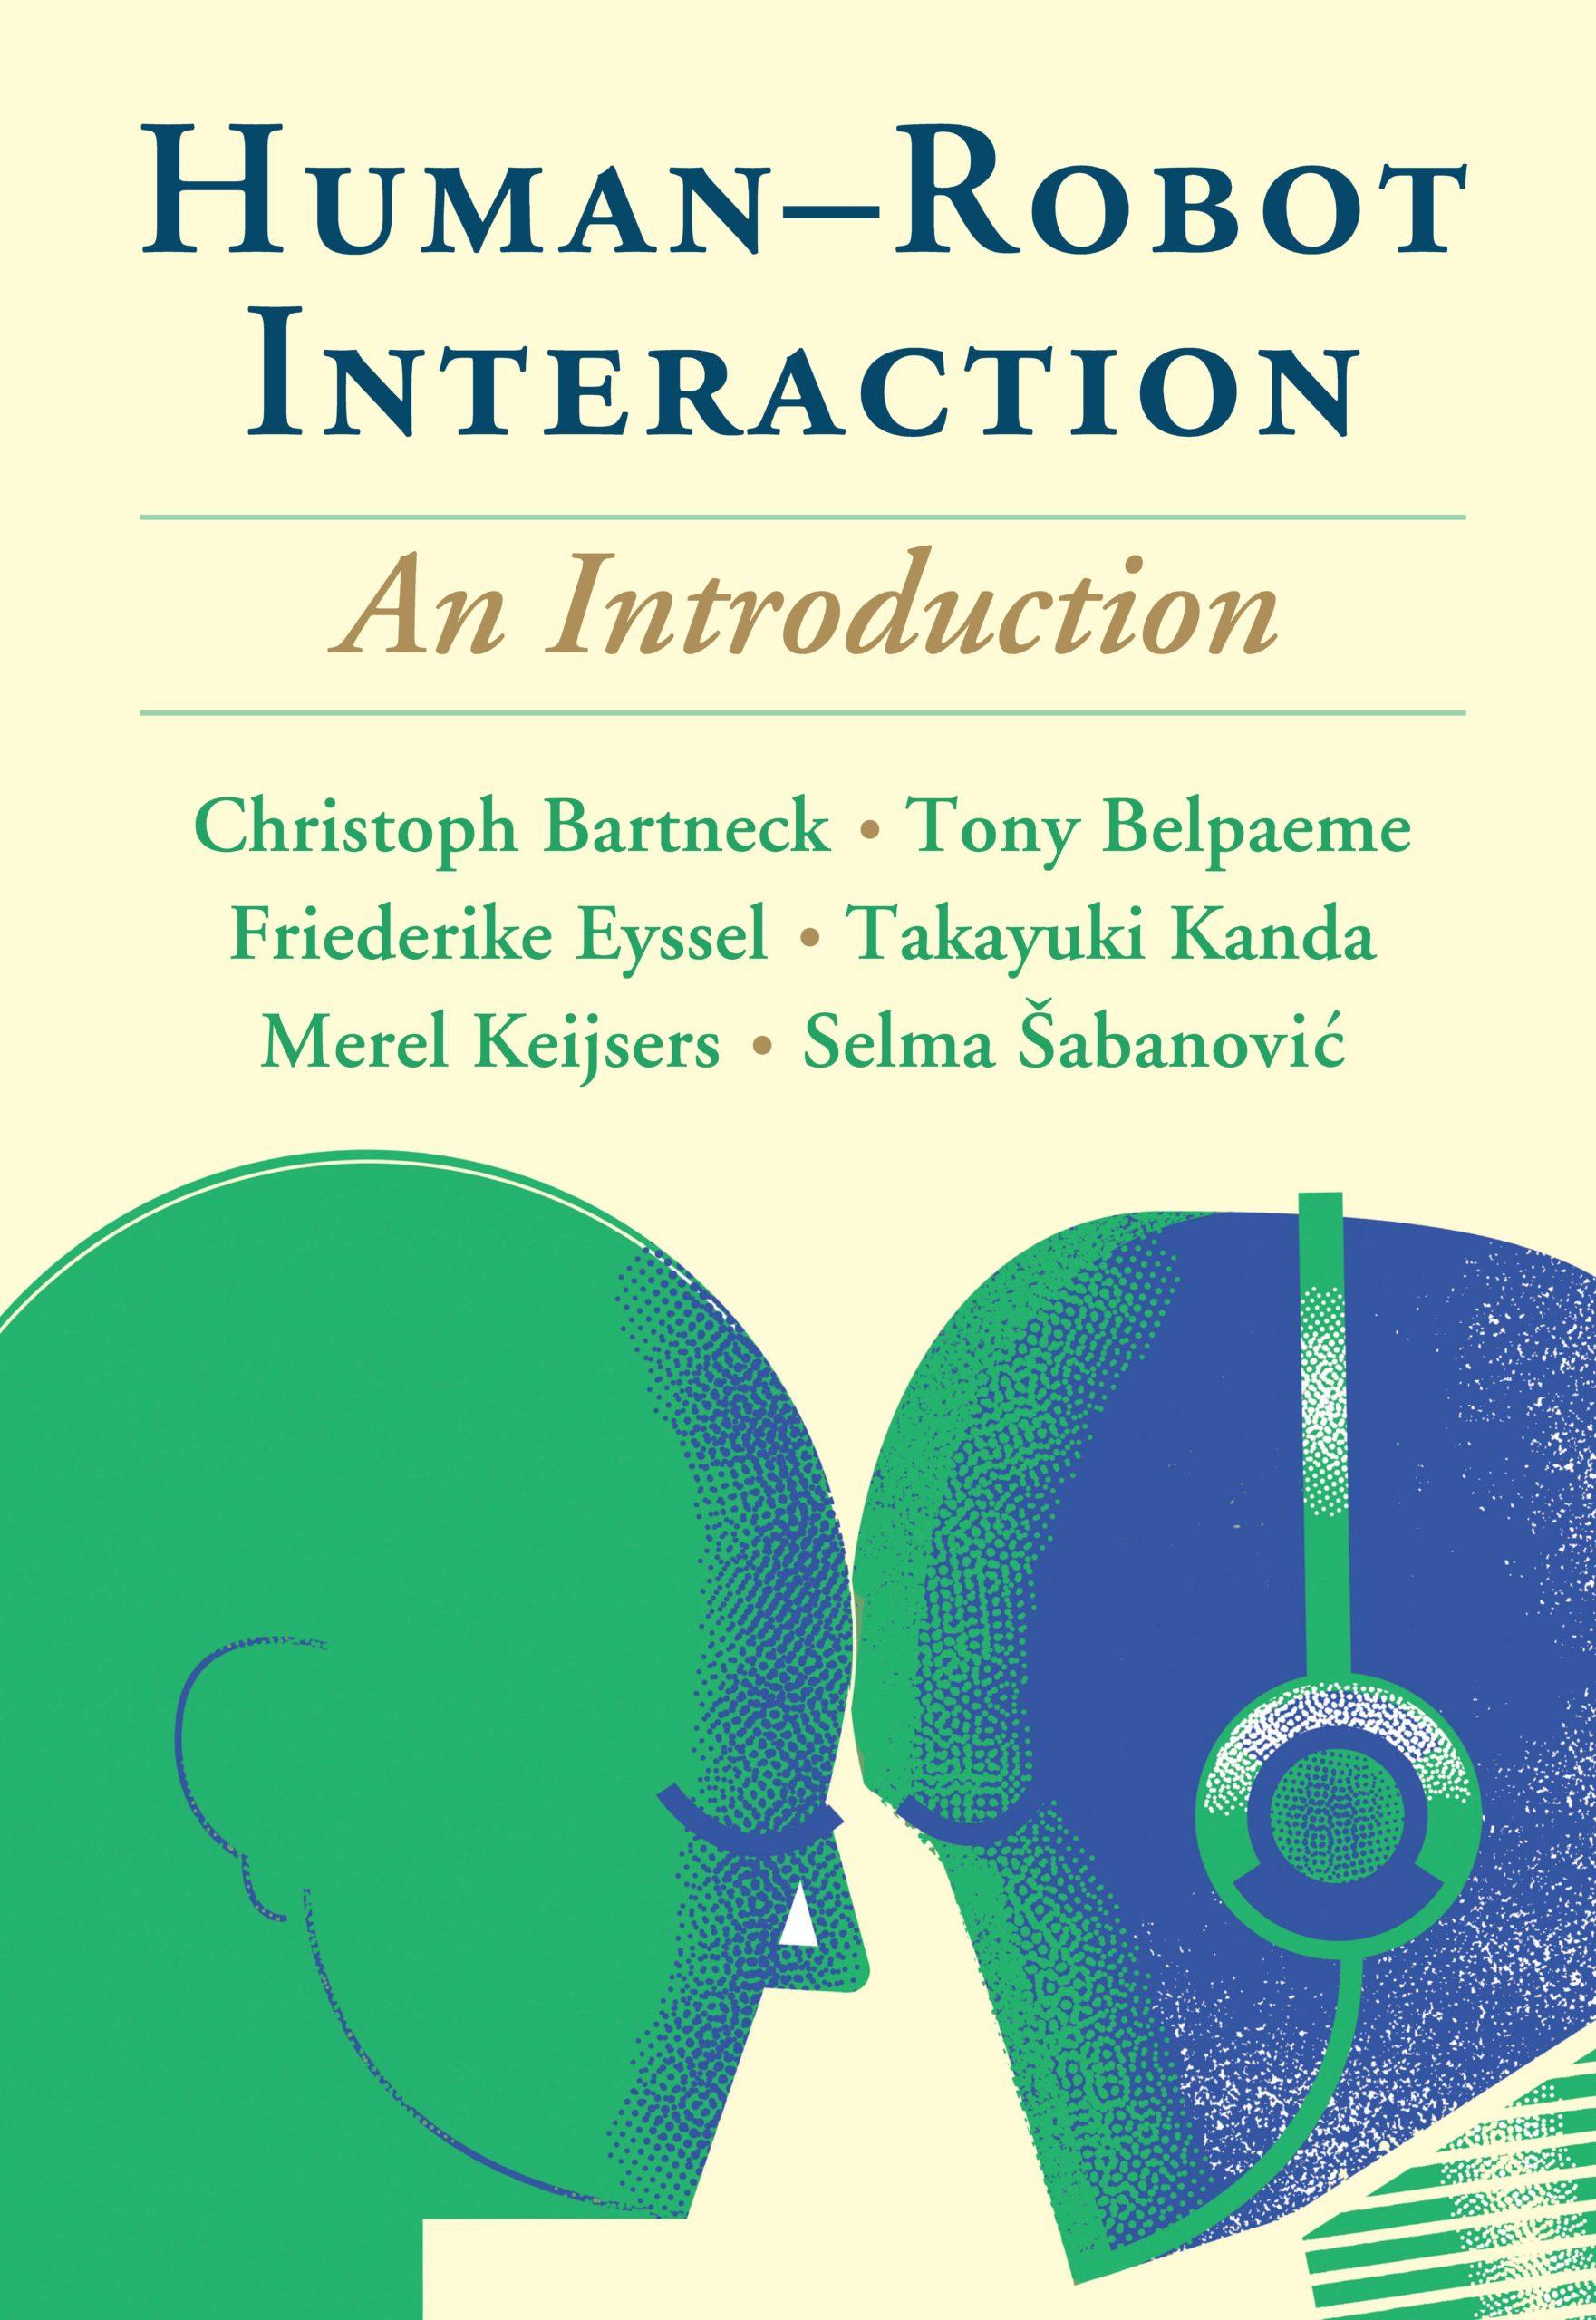 Human-Robot Interaction — An Introduction